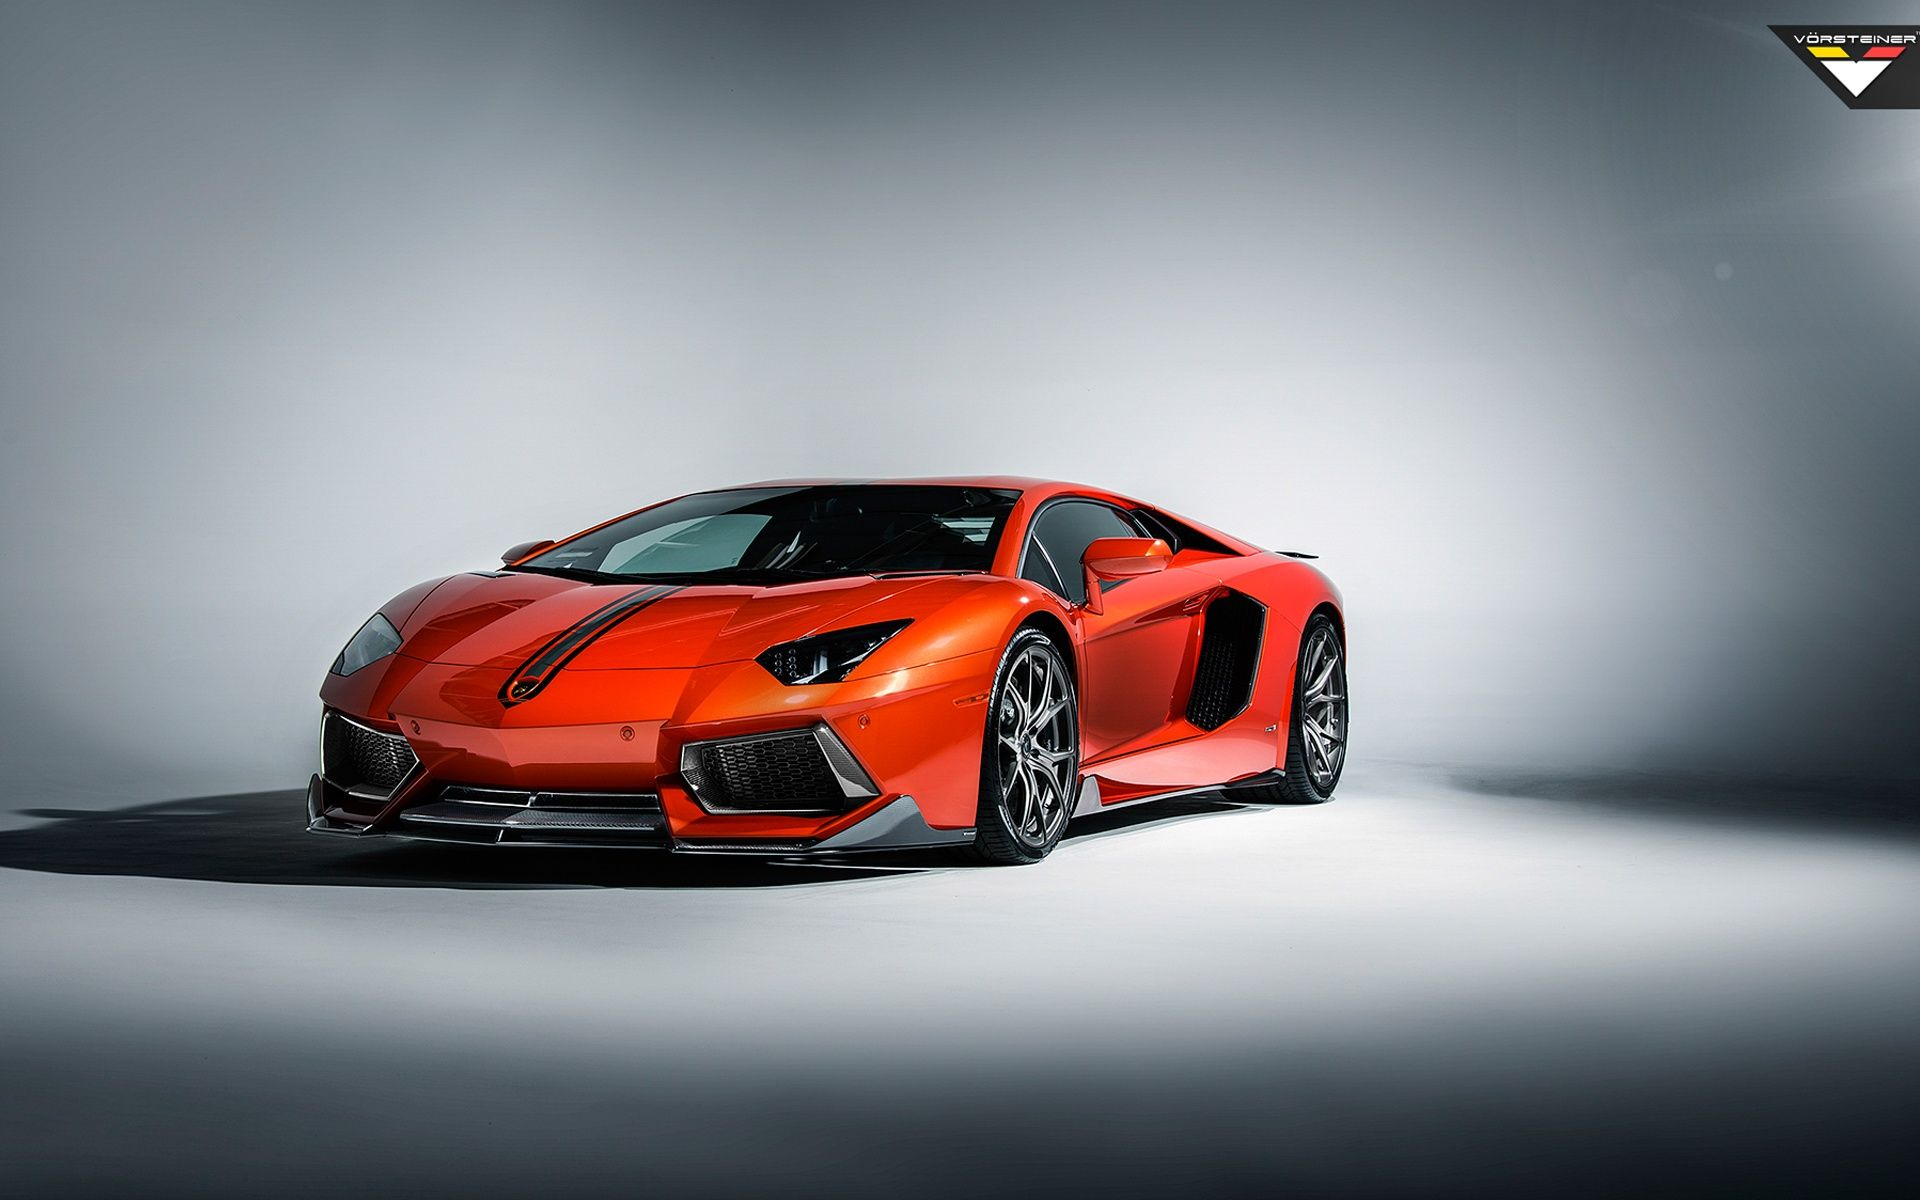 cffe3e4d44226acb98d4e9f481d4d0e4 Exciting Lamborghini Huracán Lp 610-4 Cena Cars Trend